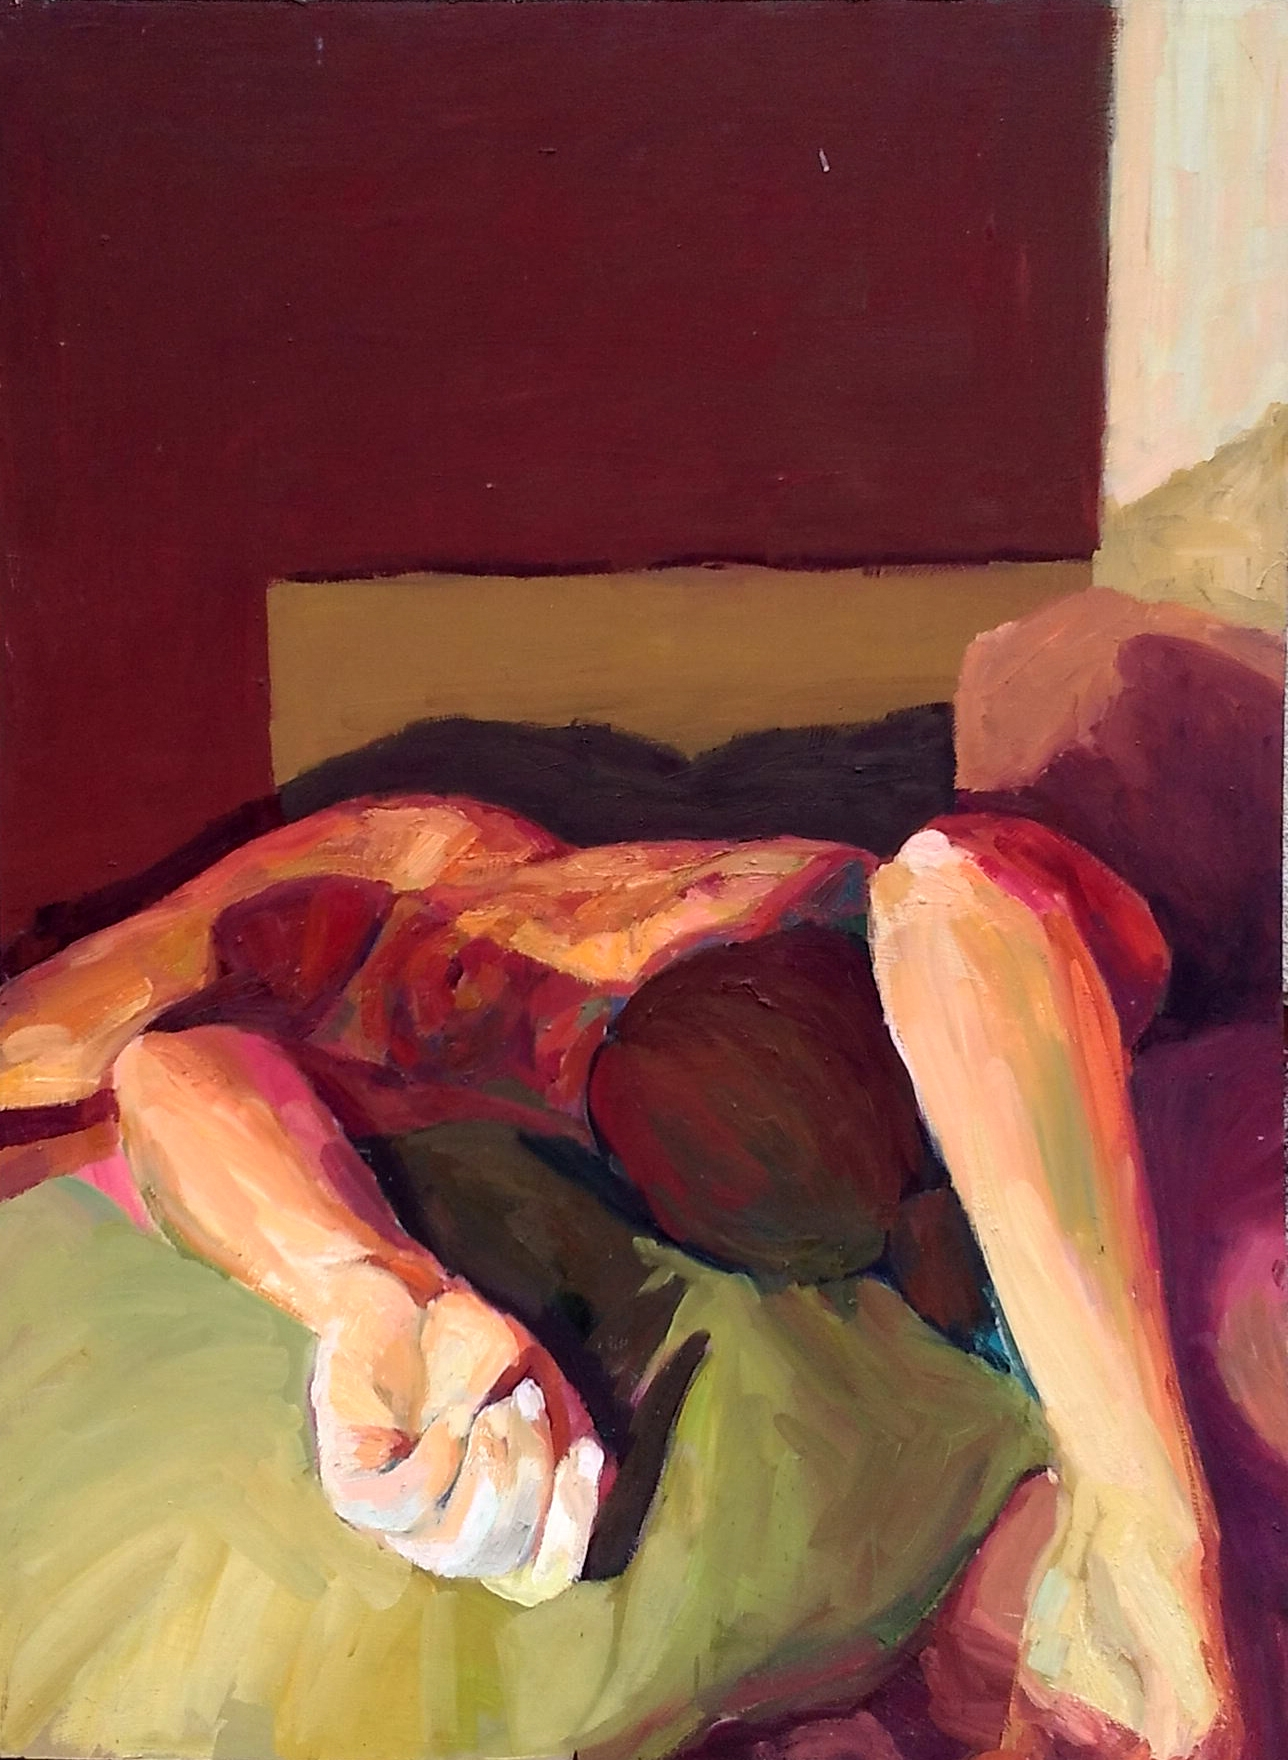 Red room, oil lino, 90 120 cm,  - suzanadzelatovic   ello